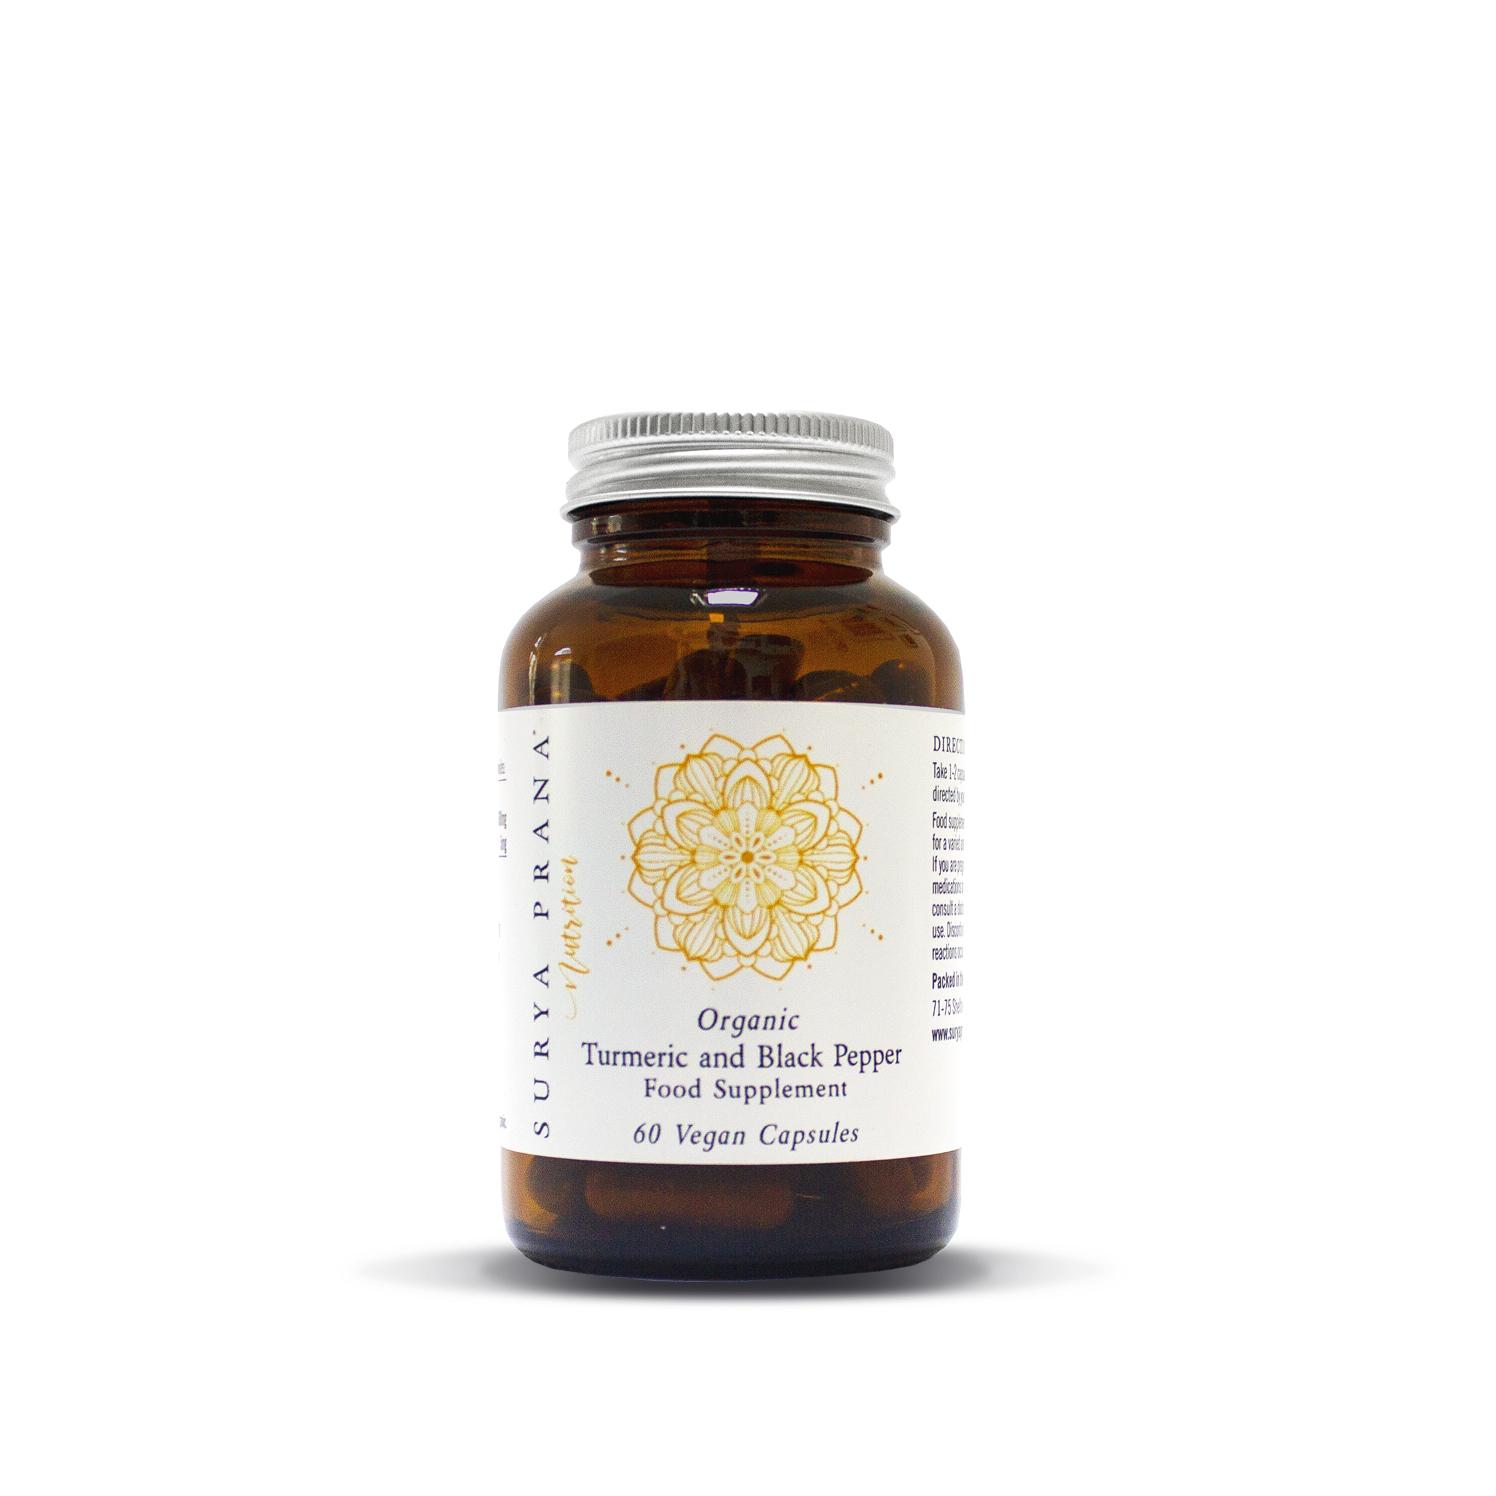 Organic Turmeric and Black Pepper (capsules) 60's